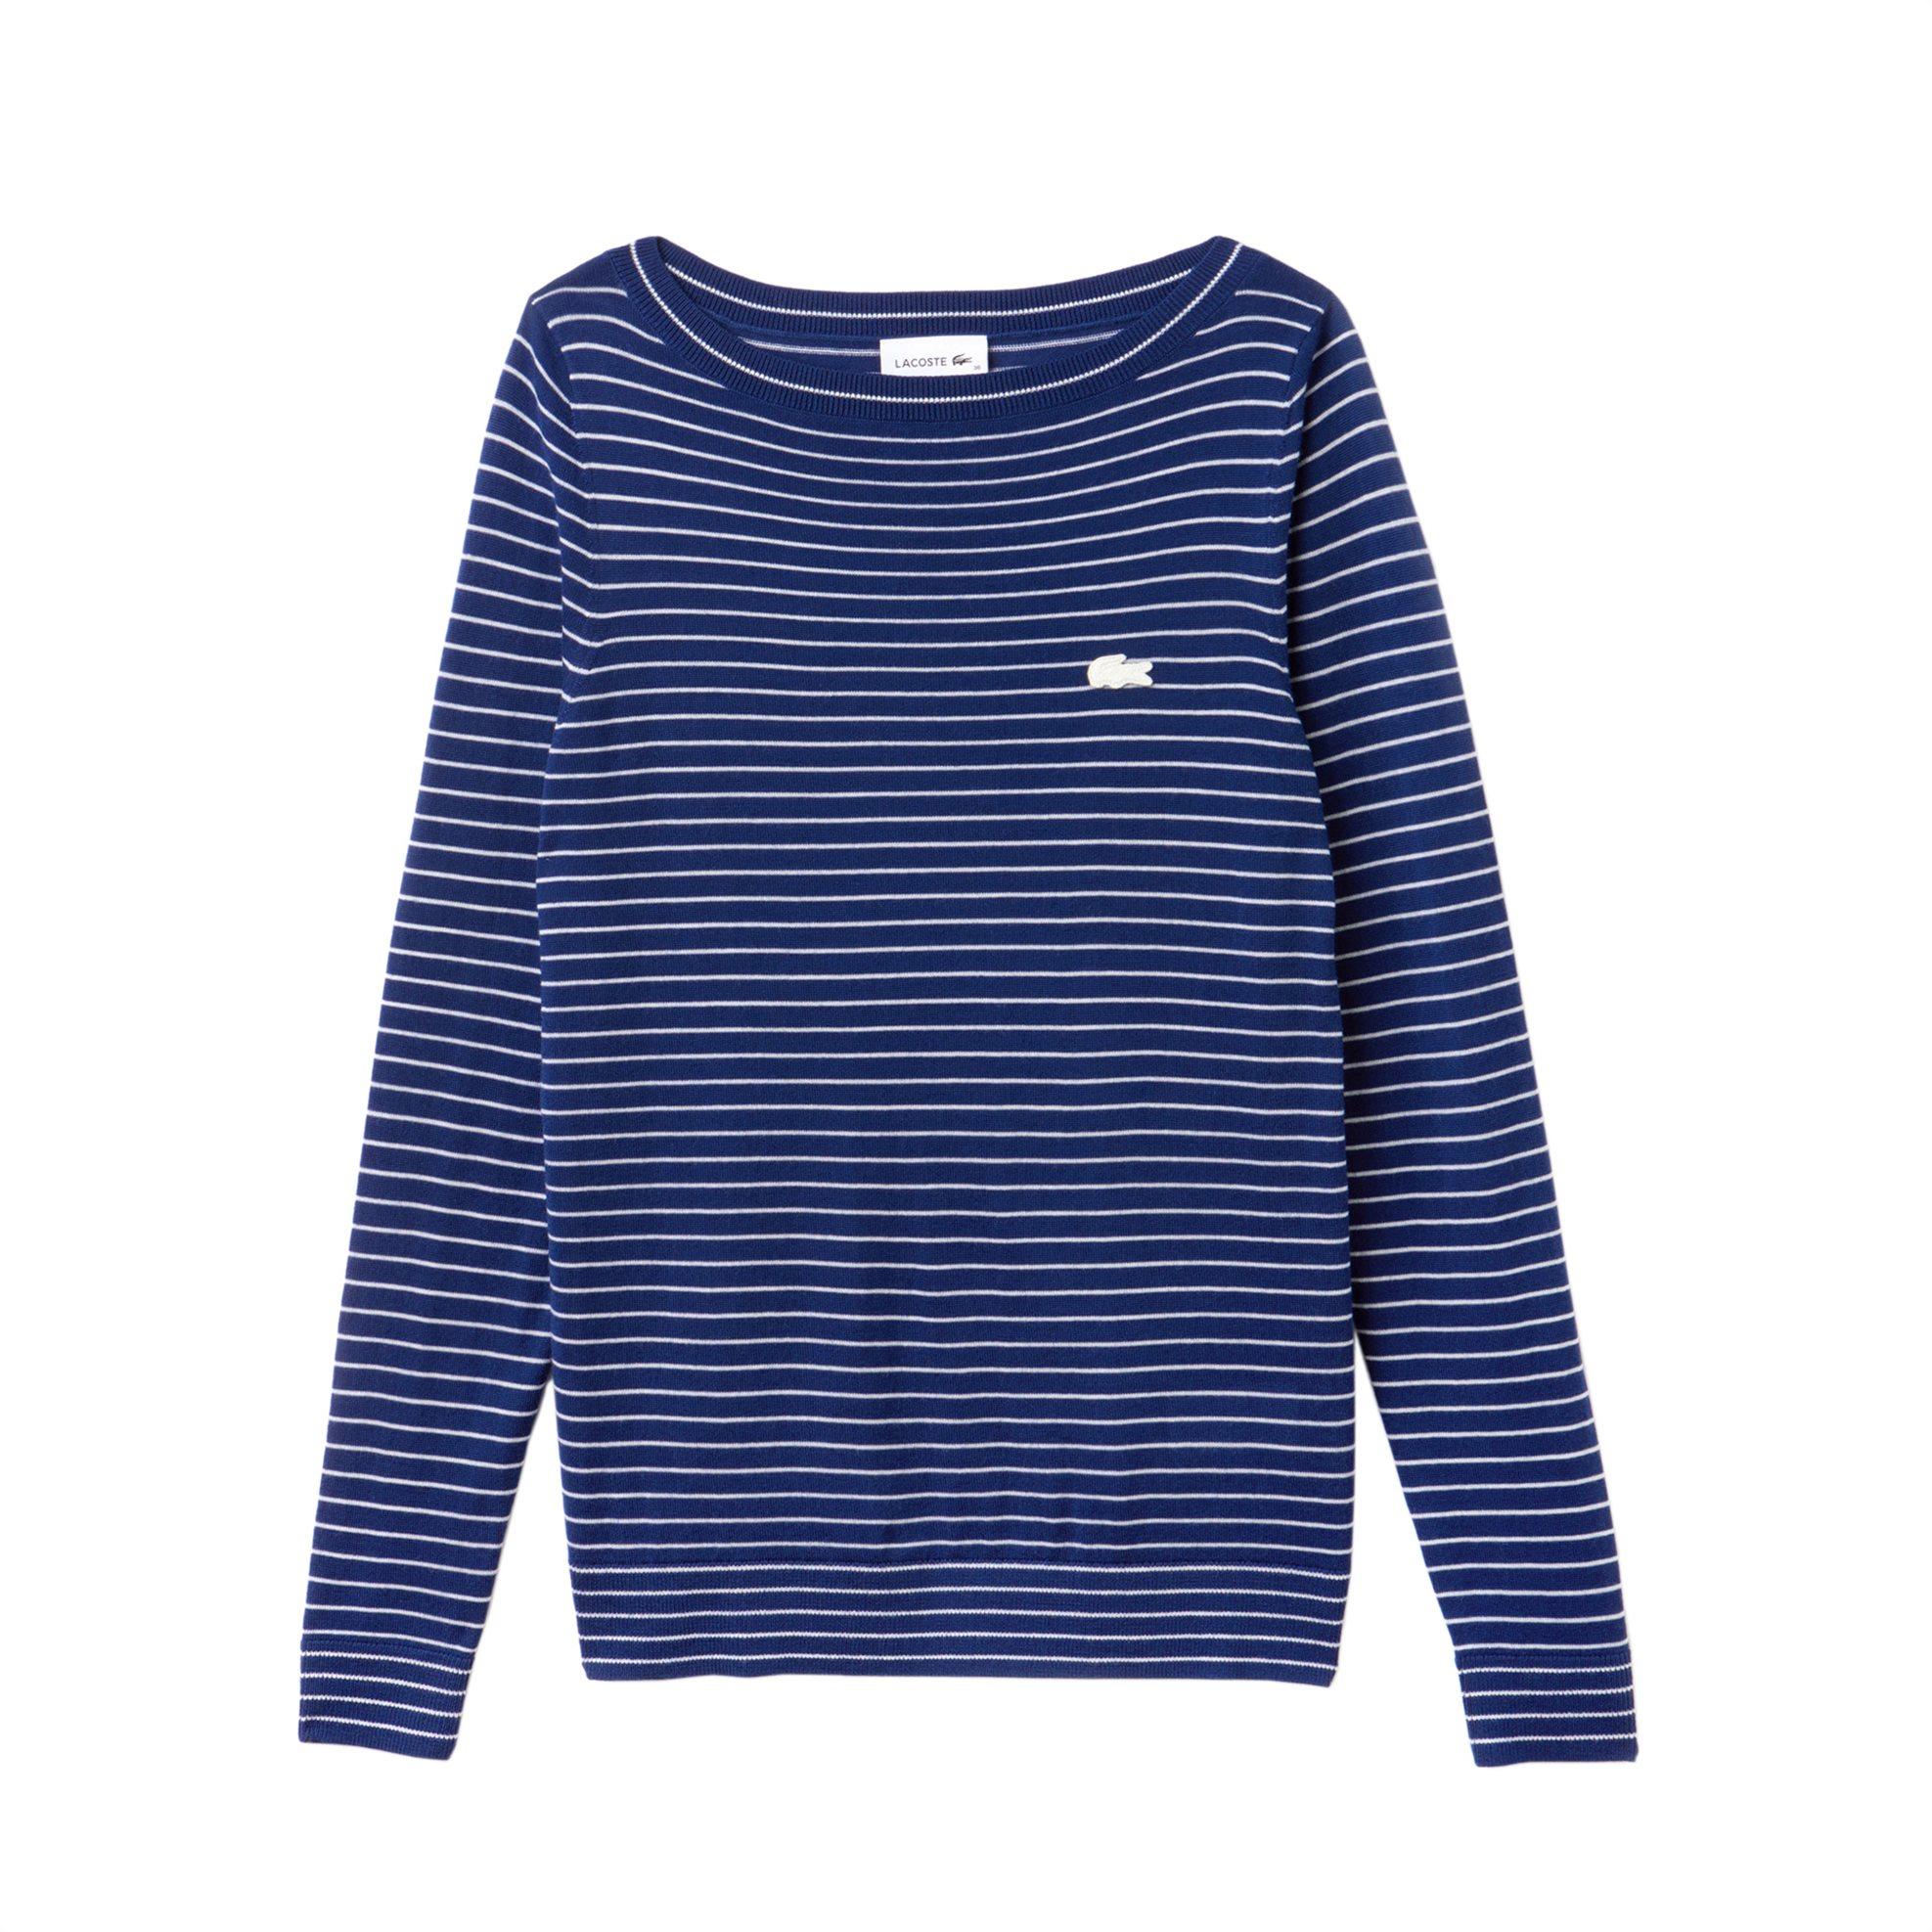 c8f5bc92101a Lacoste ριγέ γυναικεία πλεκτή μπλούζα με λαιμόκοψη χαμόγελο - AF8827 - Μπλε